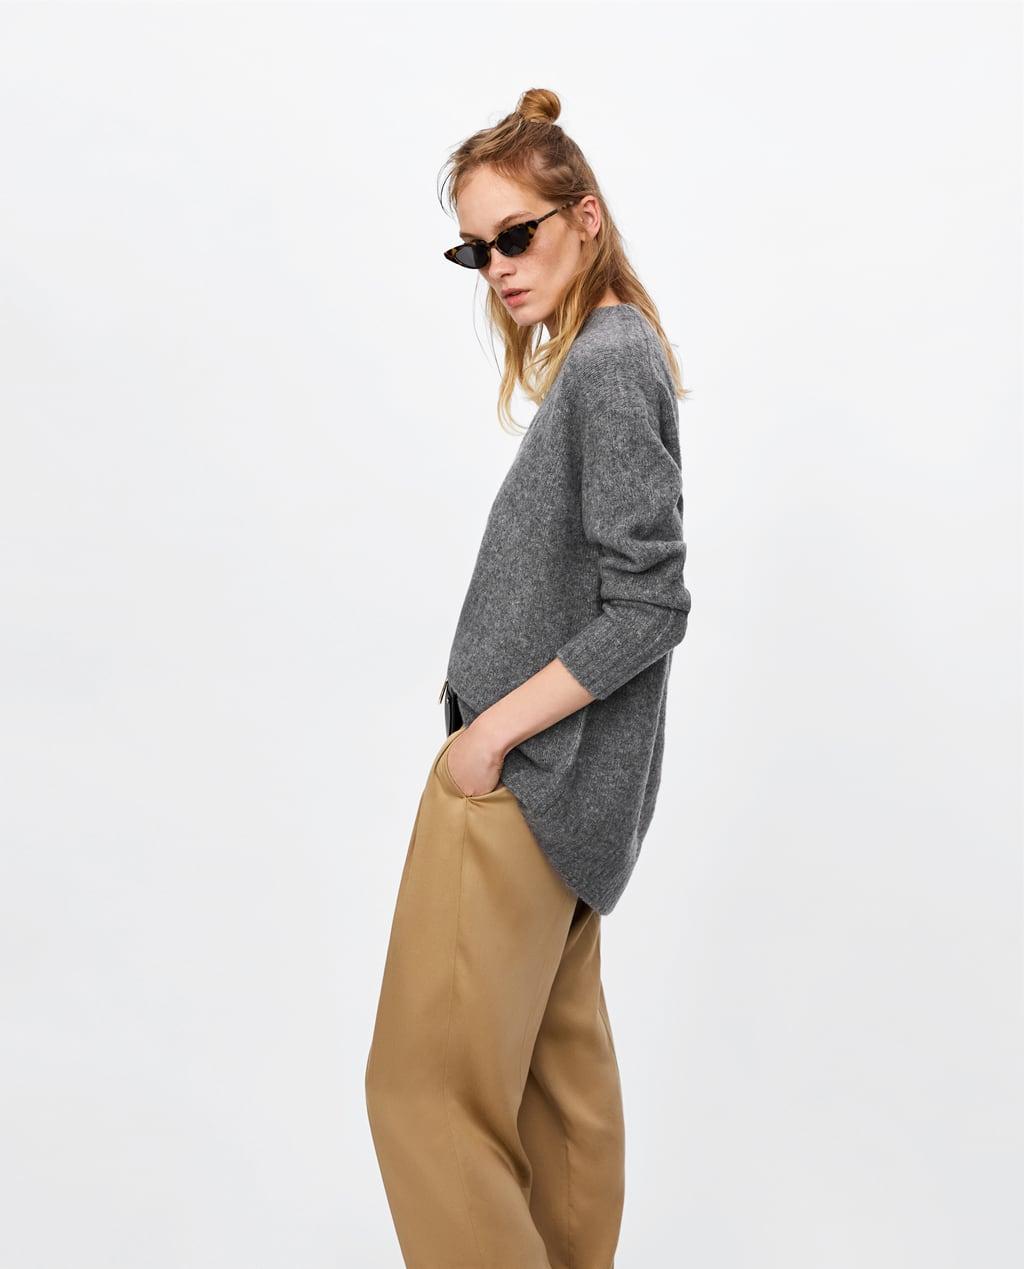 ZARA Oversized sweater $59.95